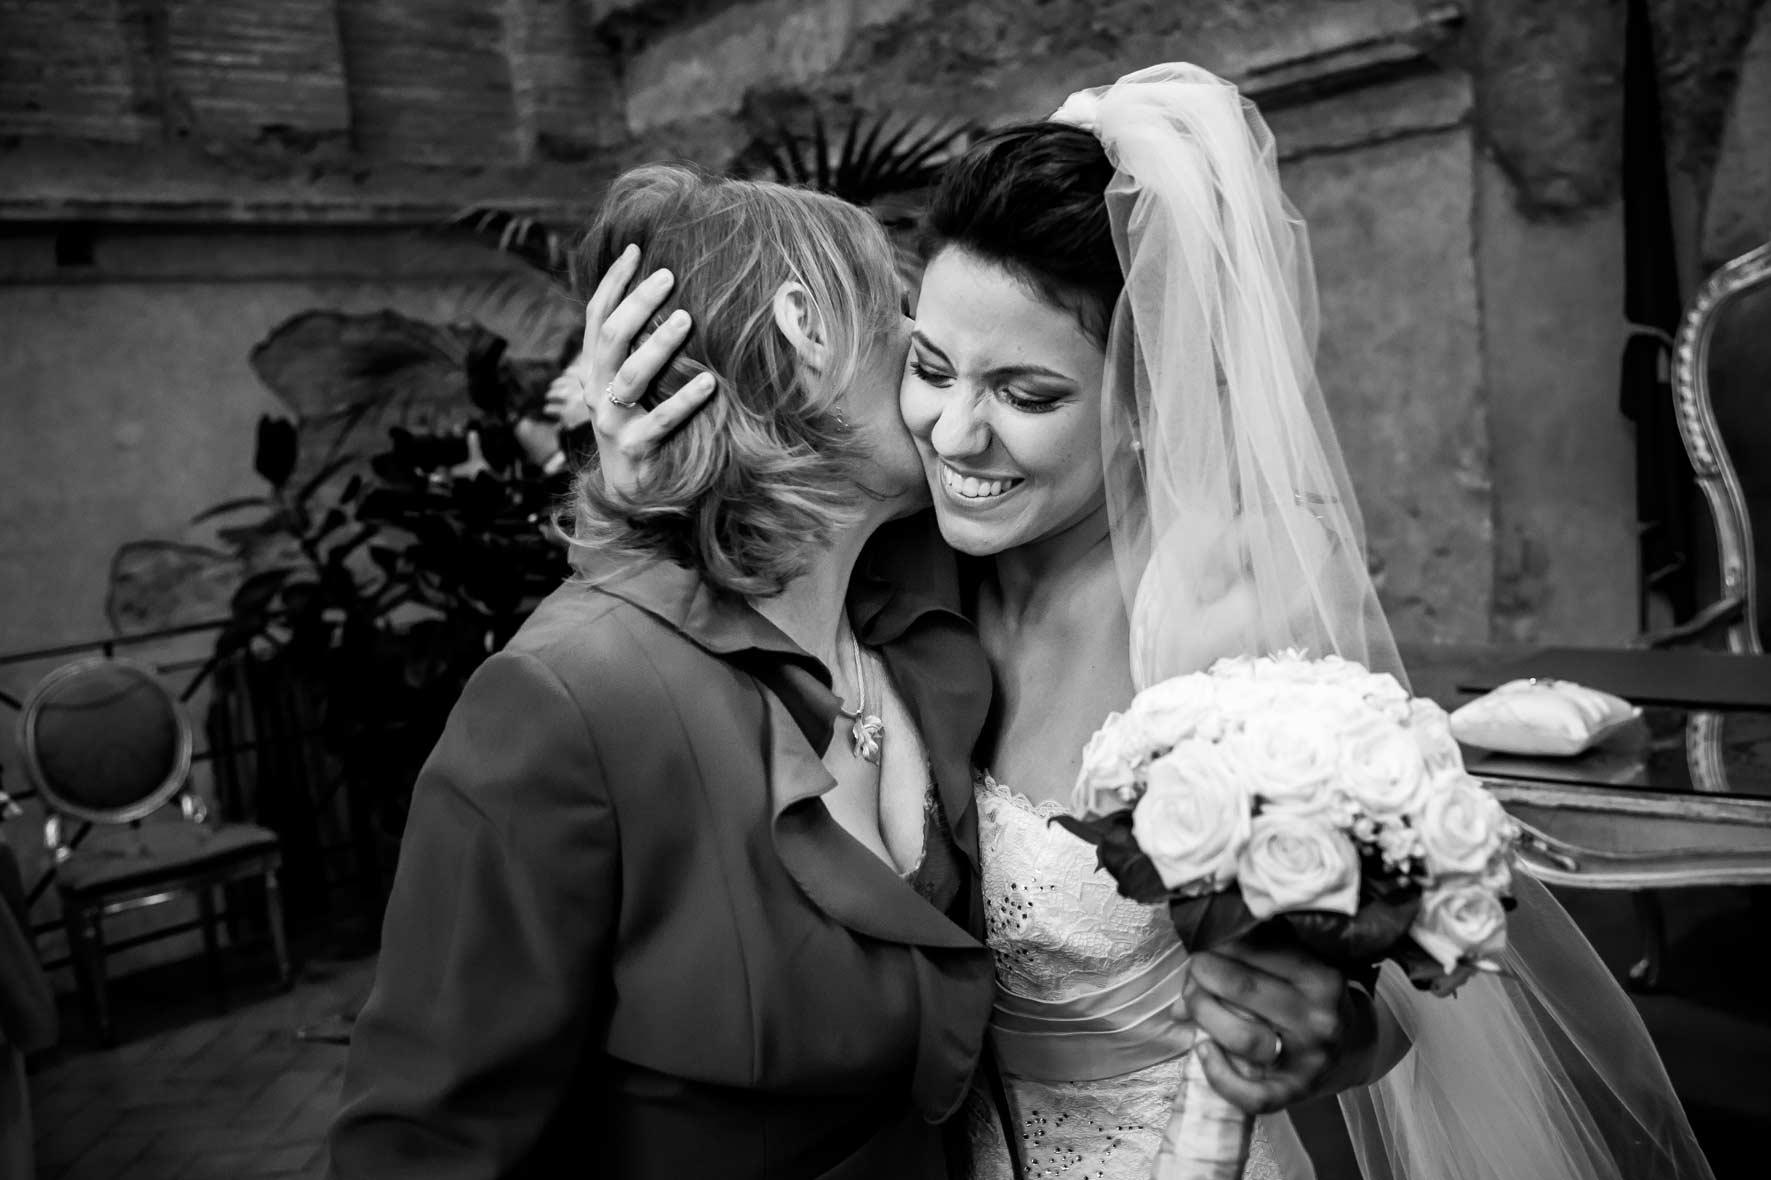 Reportage-Wedding-Photographer-in-Italy-Rome-2-Ceremony